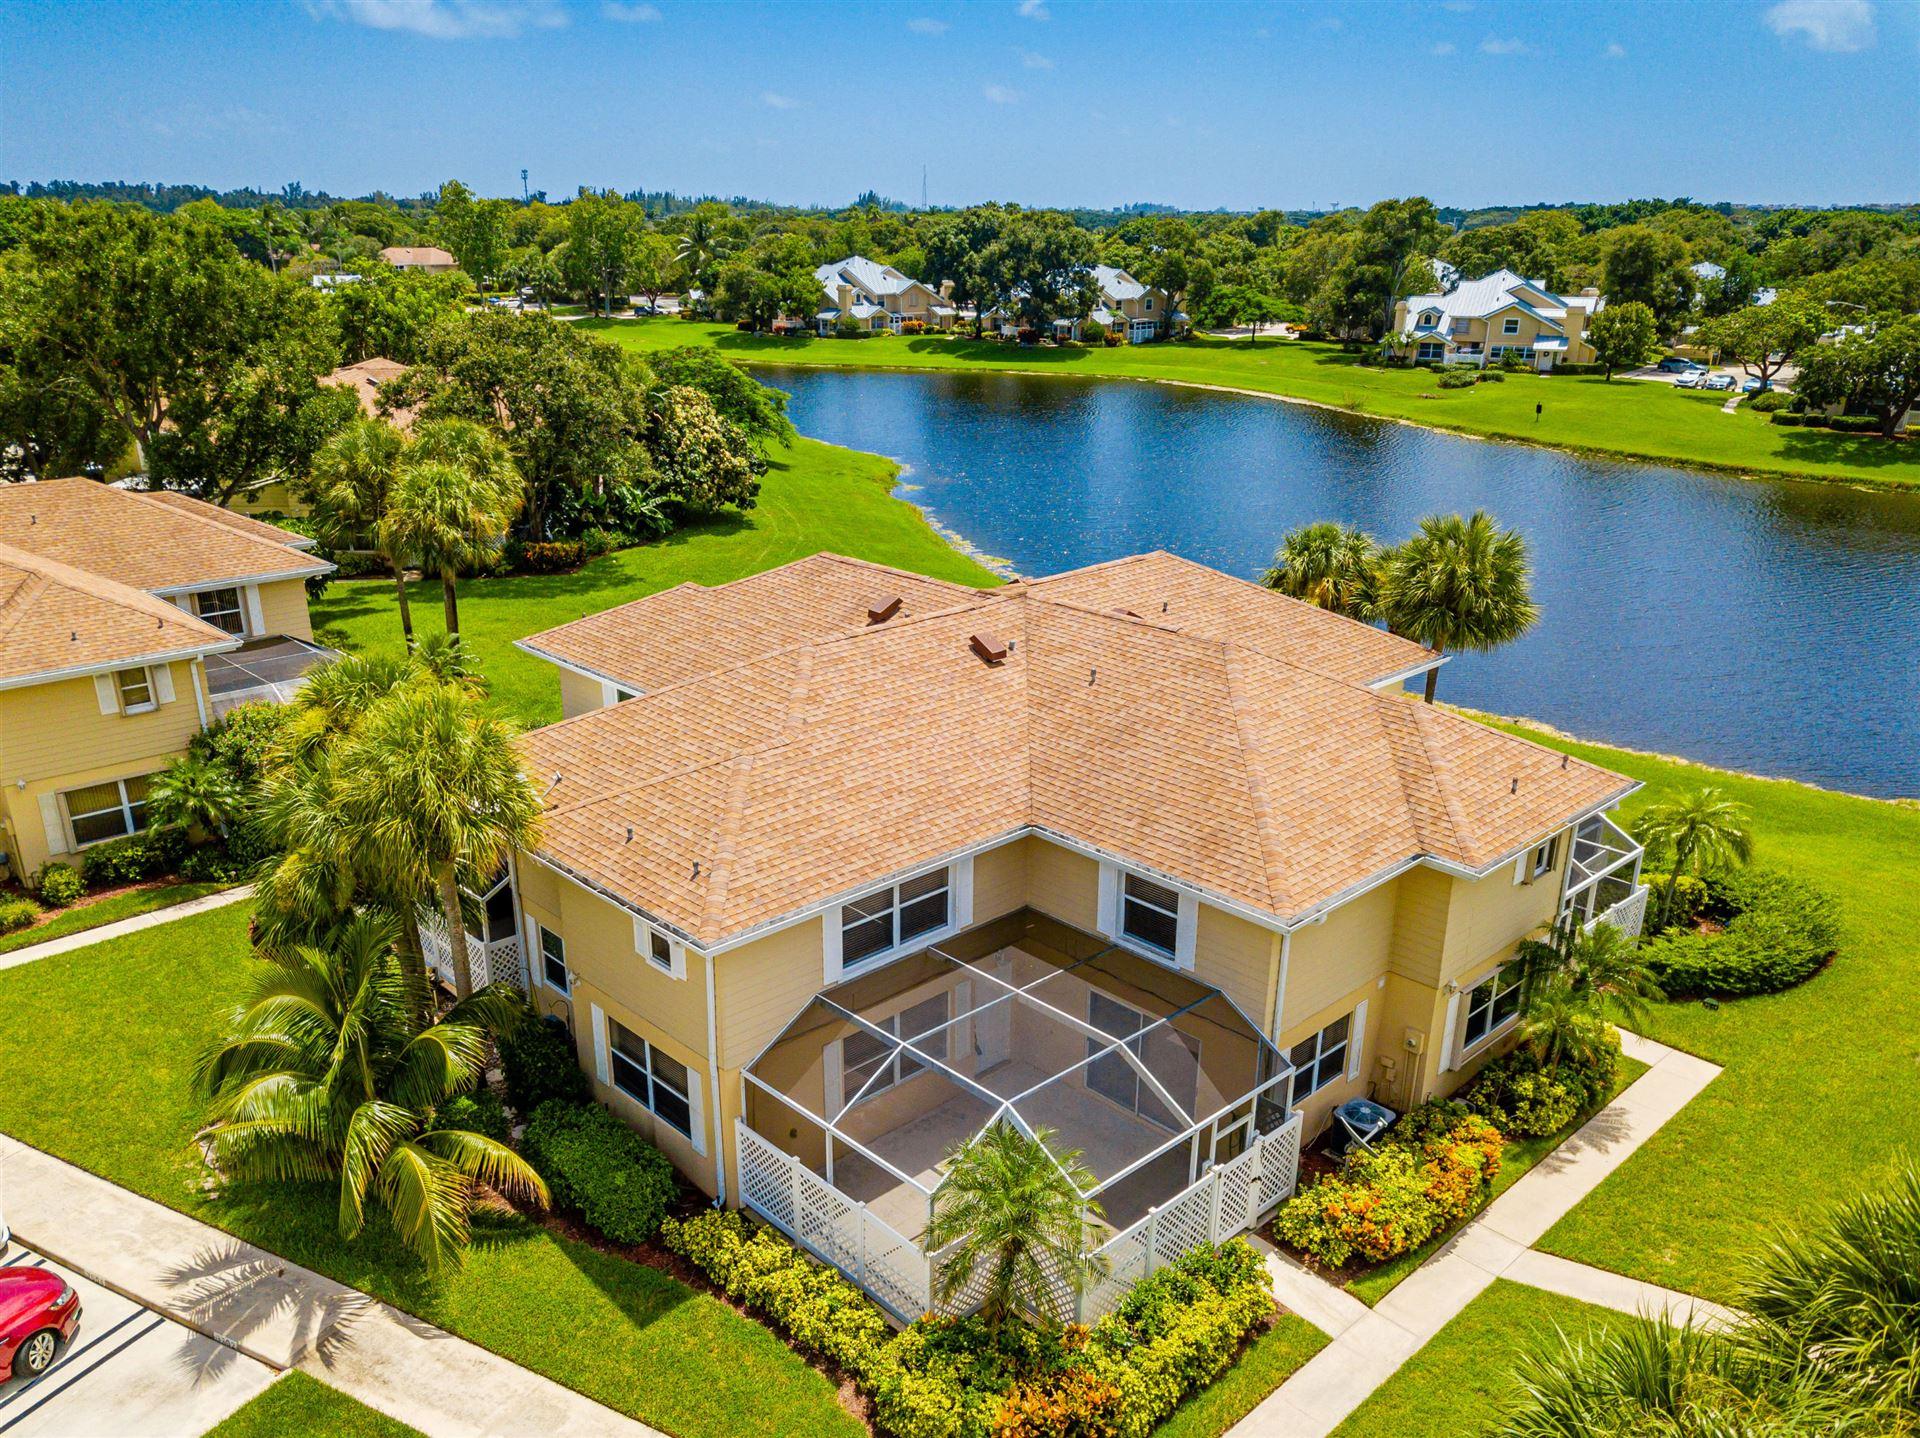 3601 Medford Court, Boynton Beach, FL 33436 - #: RX-10651123